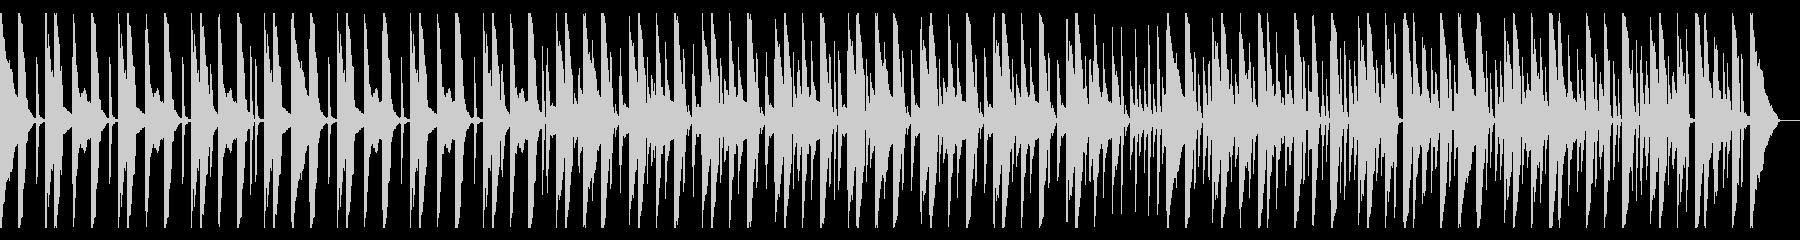 Vocal FX、167 BPMの未再生の波形